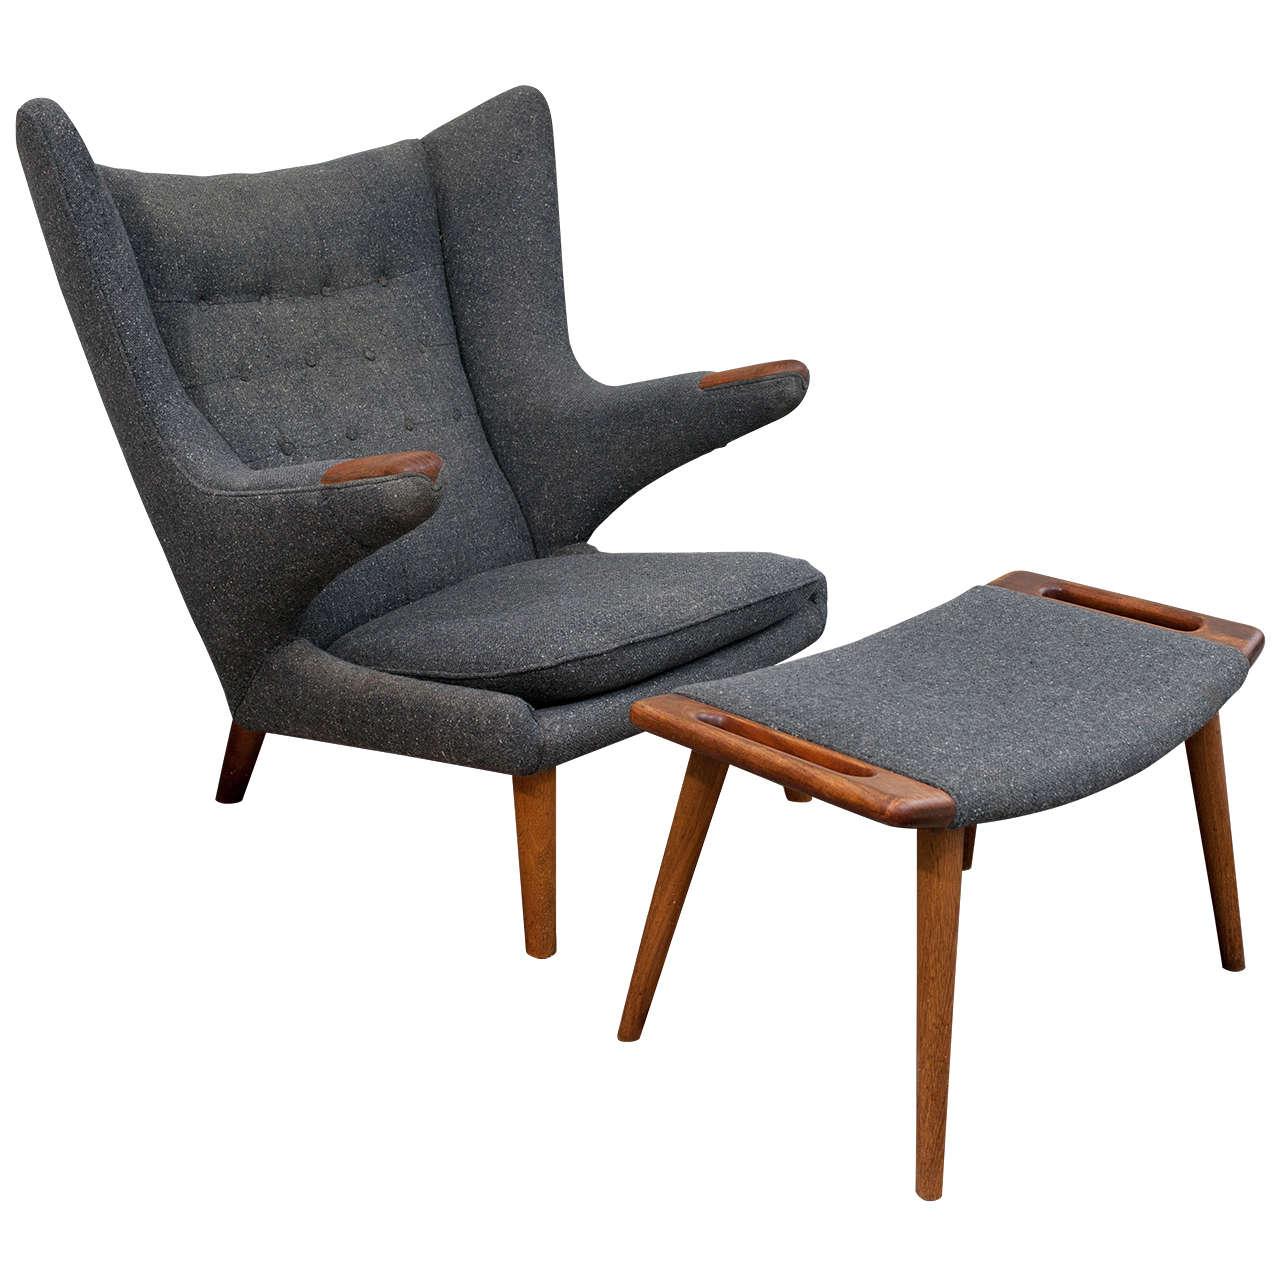 papa bear chair tempur pedic tp9000 ergonomic mesh mid back executive black vintage hans wegner and ottoman at 1stdibs